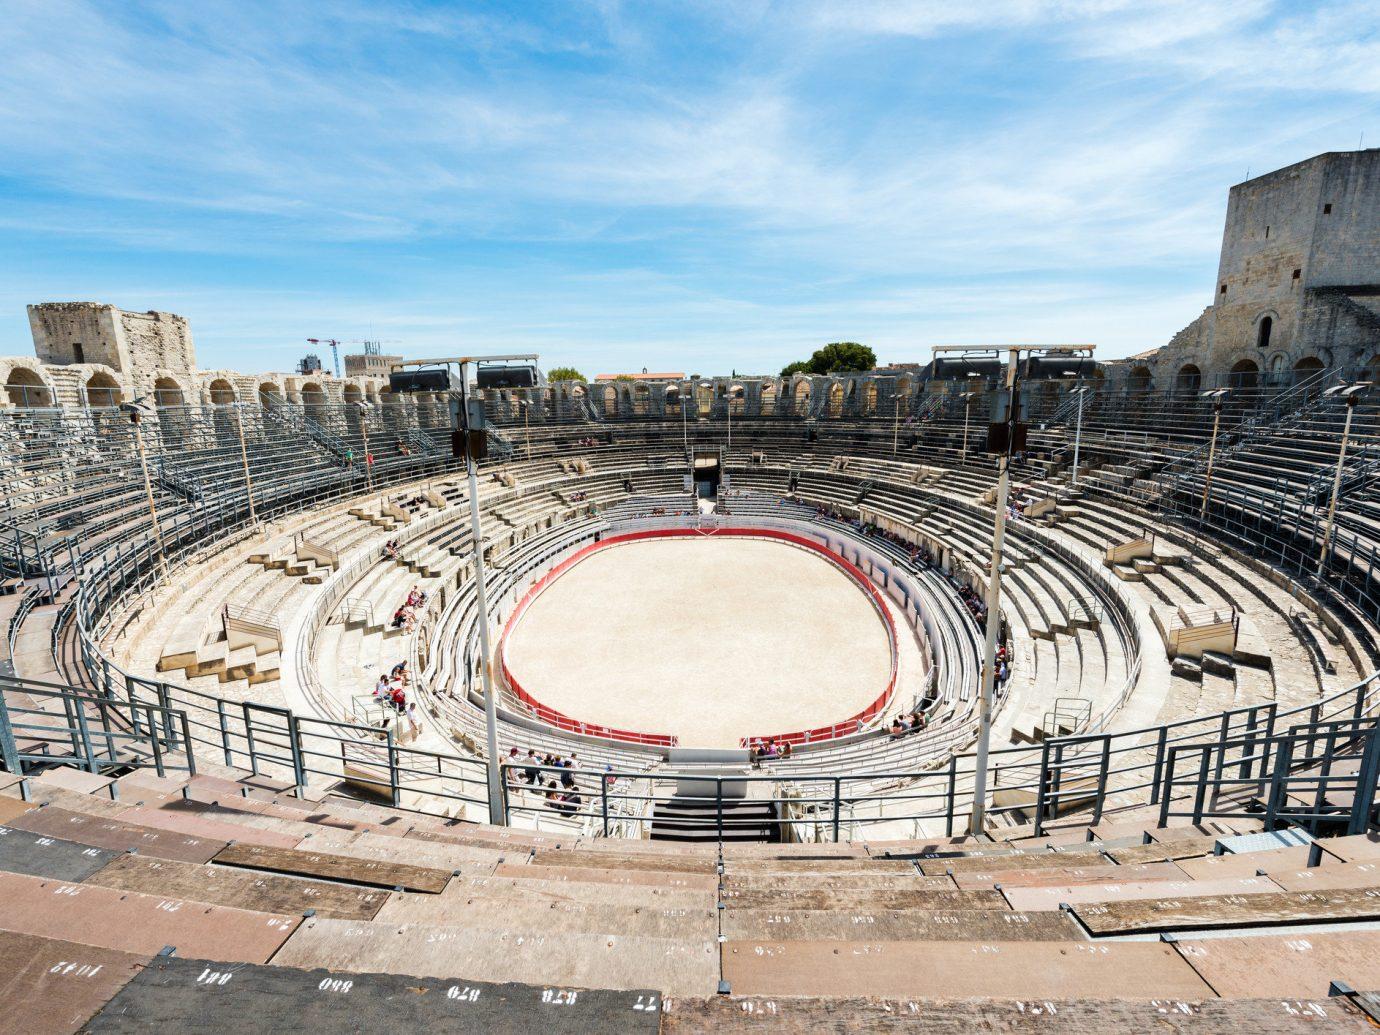 Road Trips Trip Ideas sky outdoor amphitheatre ground structure sport venue ancient history arena building